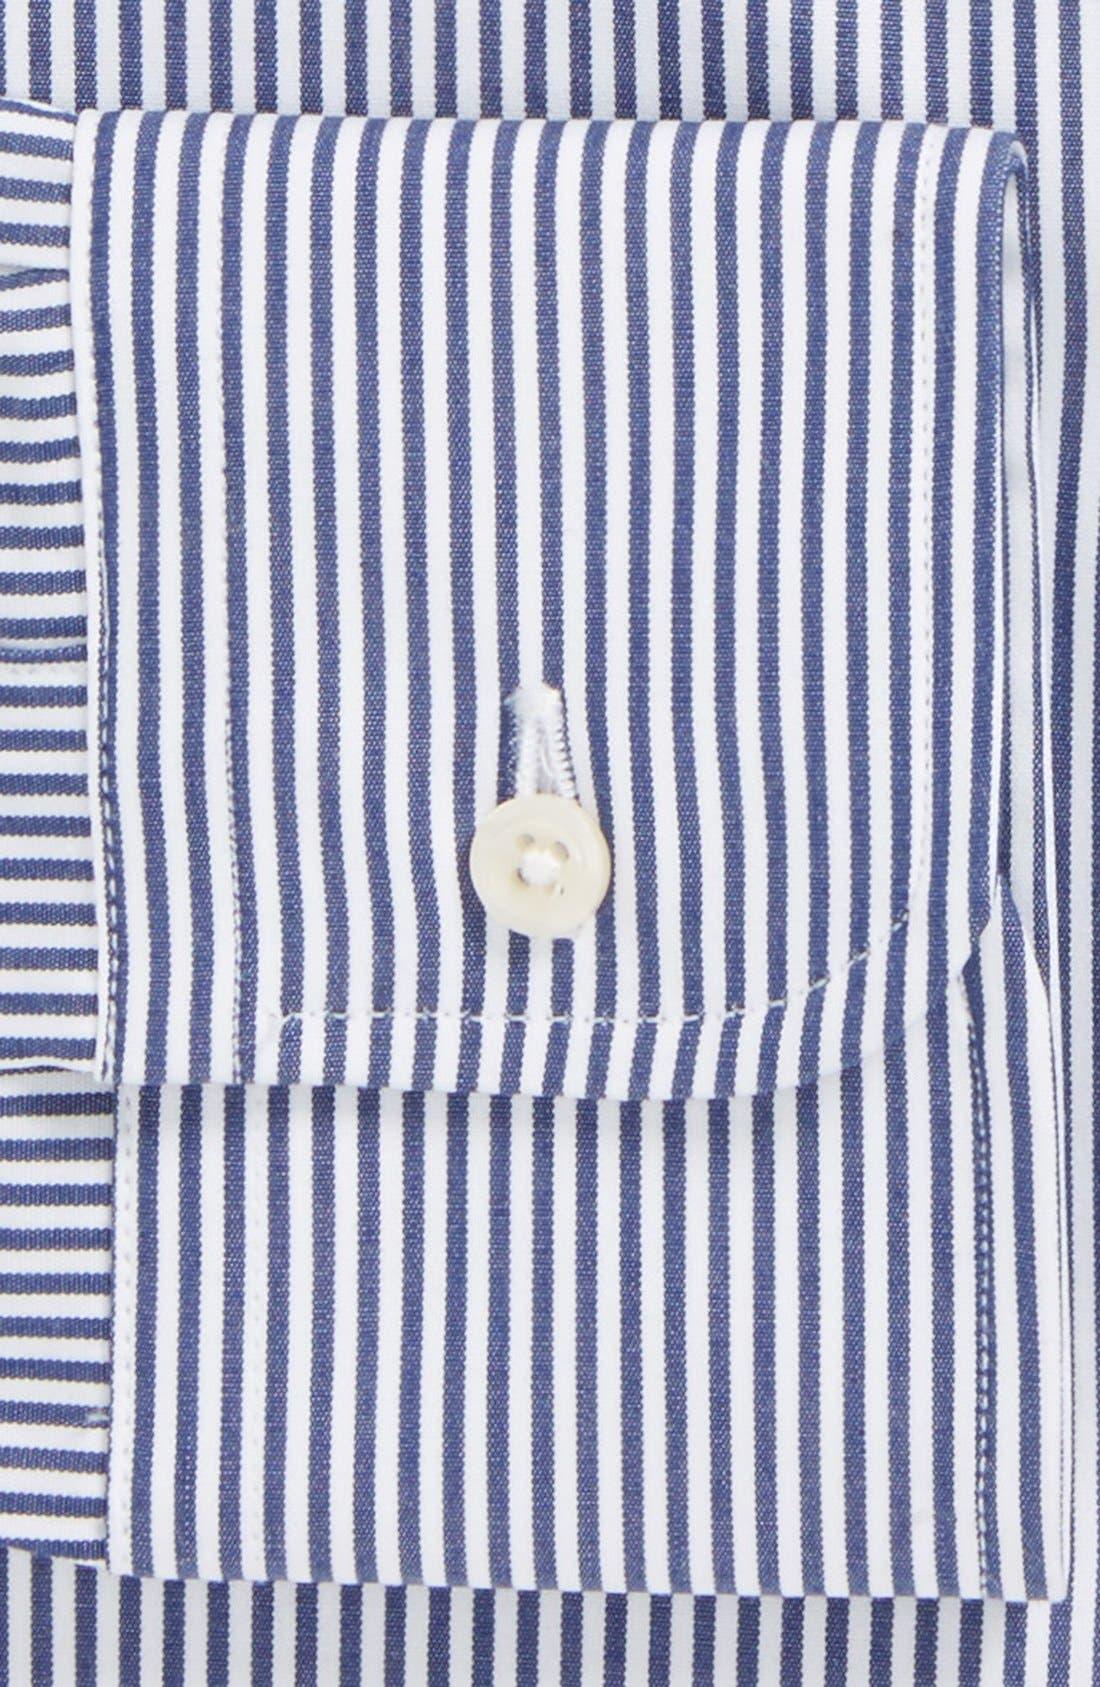 Regular Fit Bengal Stripe Cotton Broadcloth Button Down Dress Shirt,                             Alternate thumbnail 2, color,                             NAVY